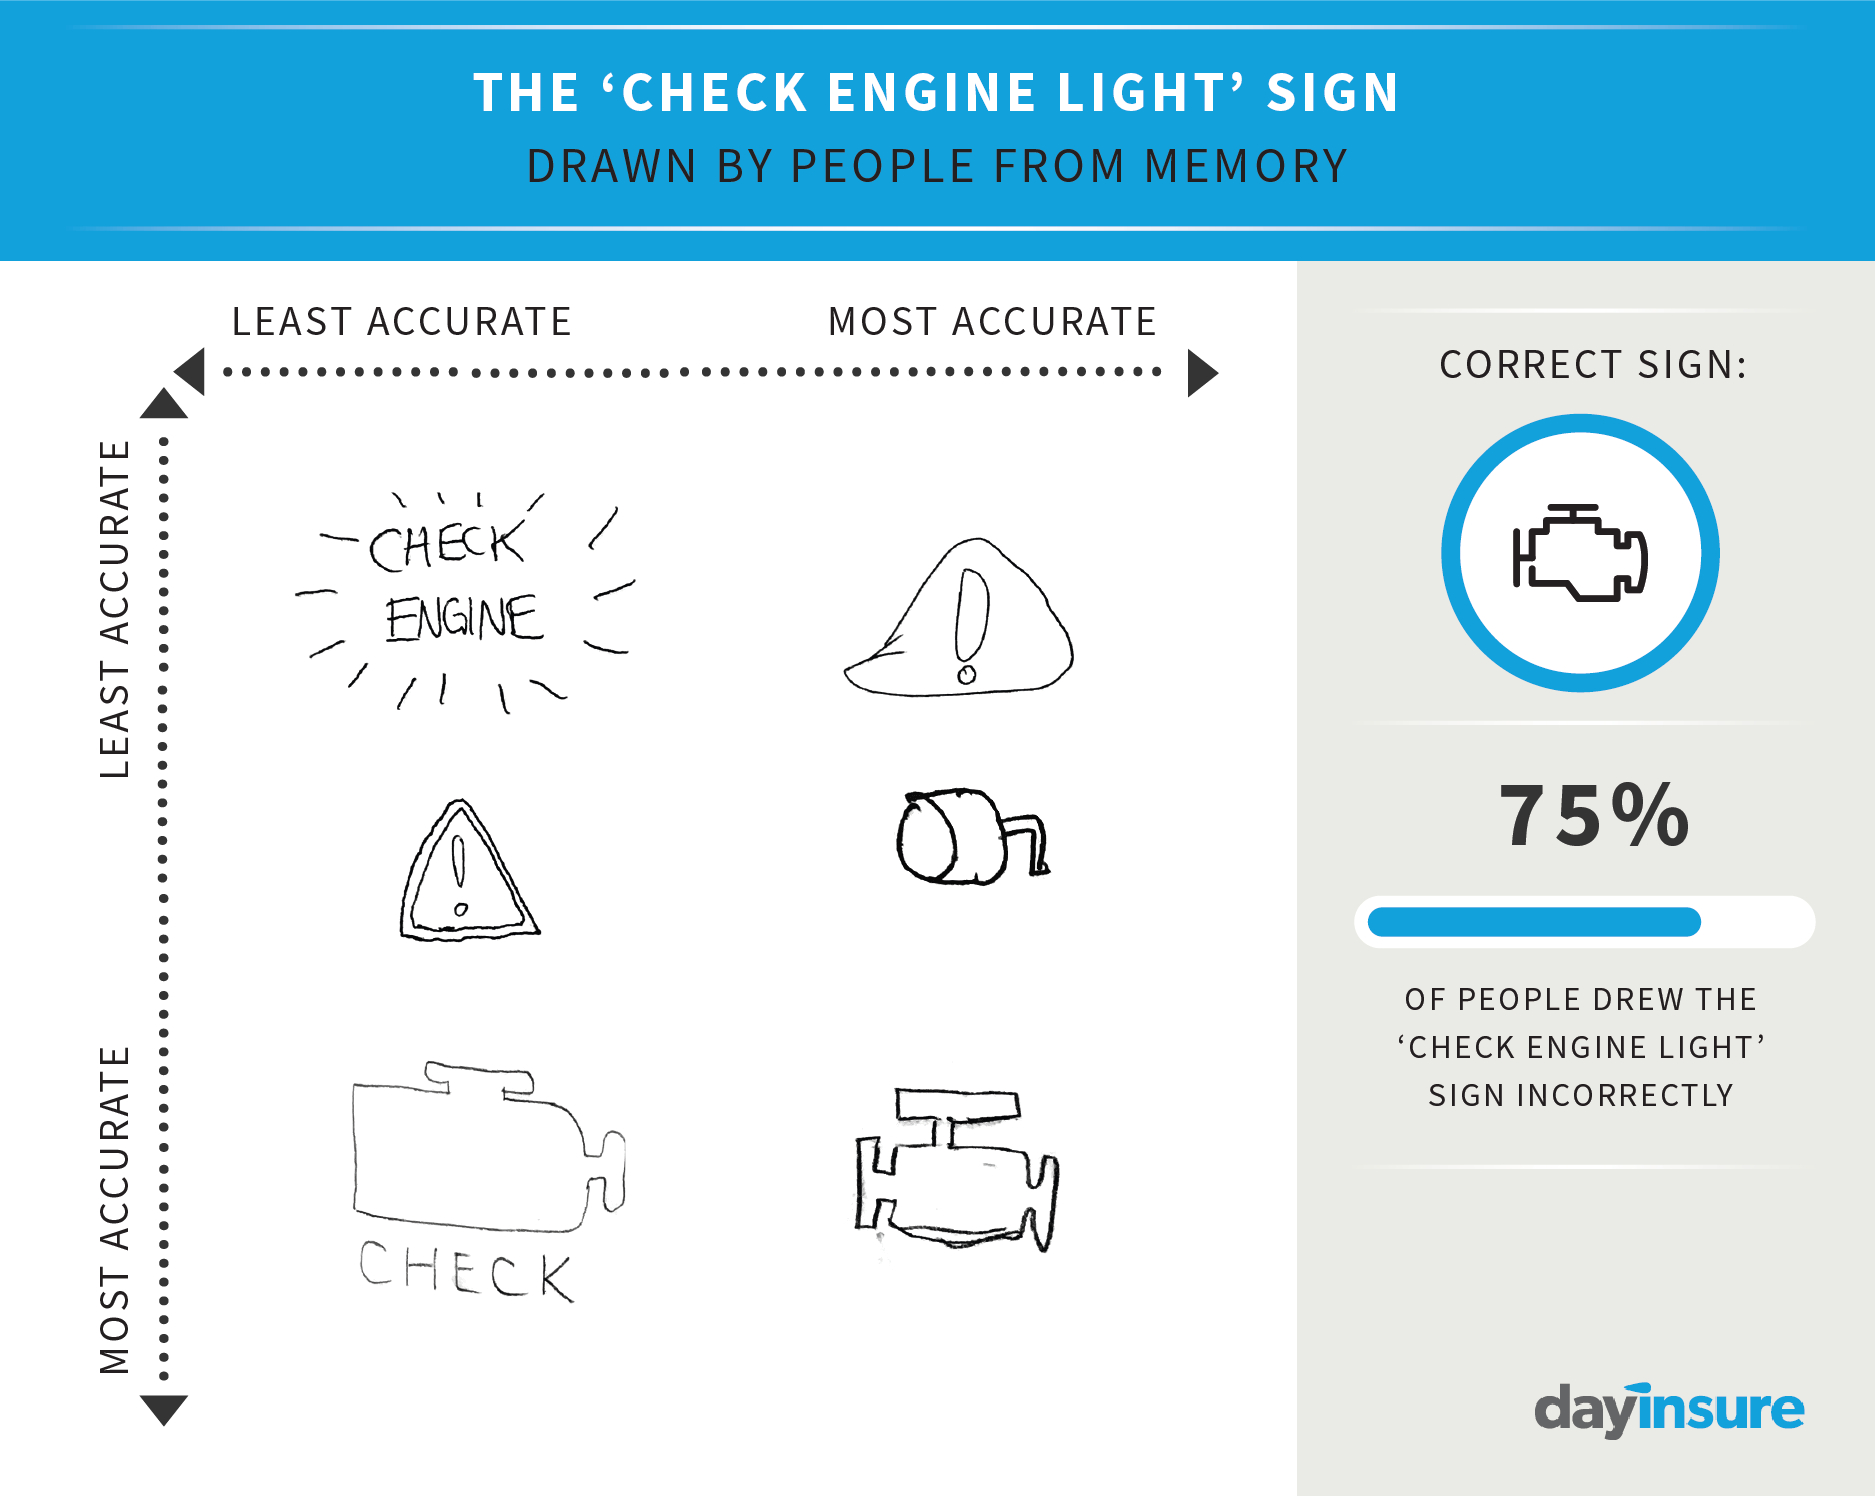 Car Dashboard Diagram Terrible Drawings Of Car Dashboard Warning Lights Show Just How Bad